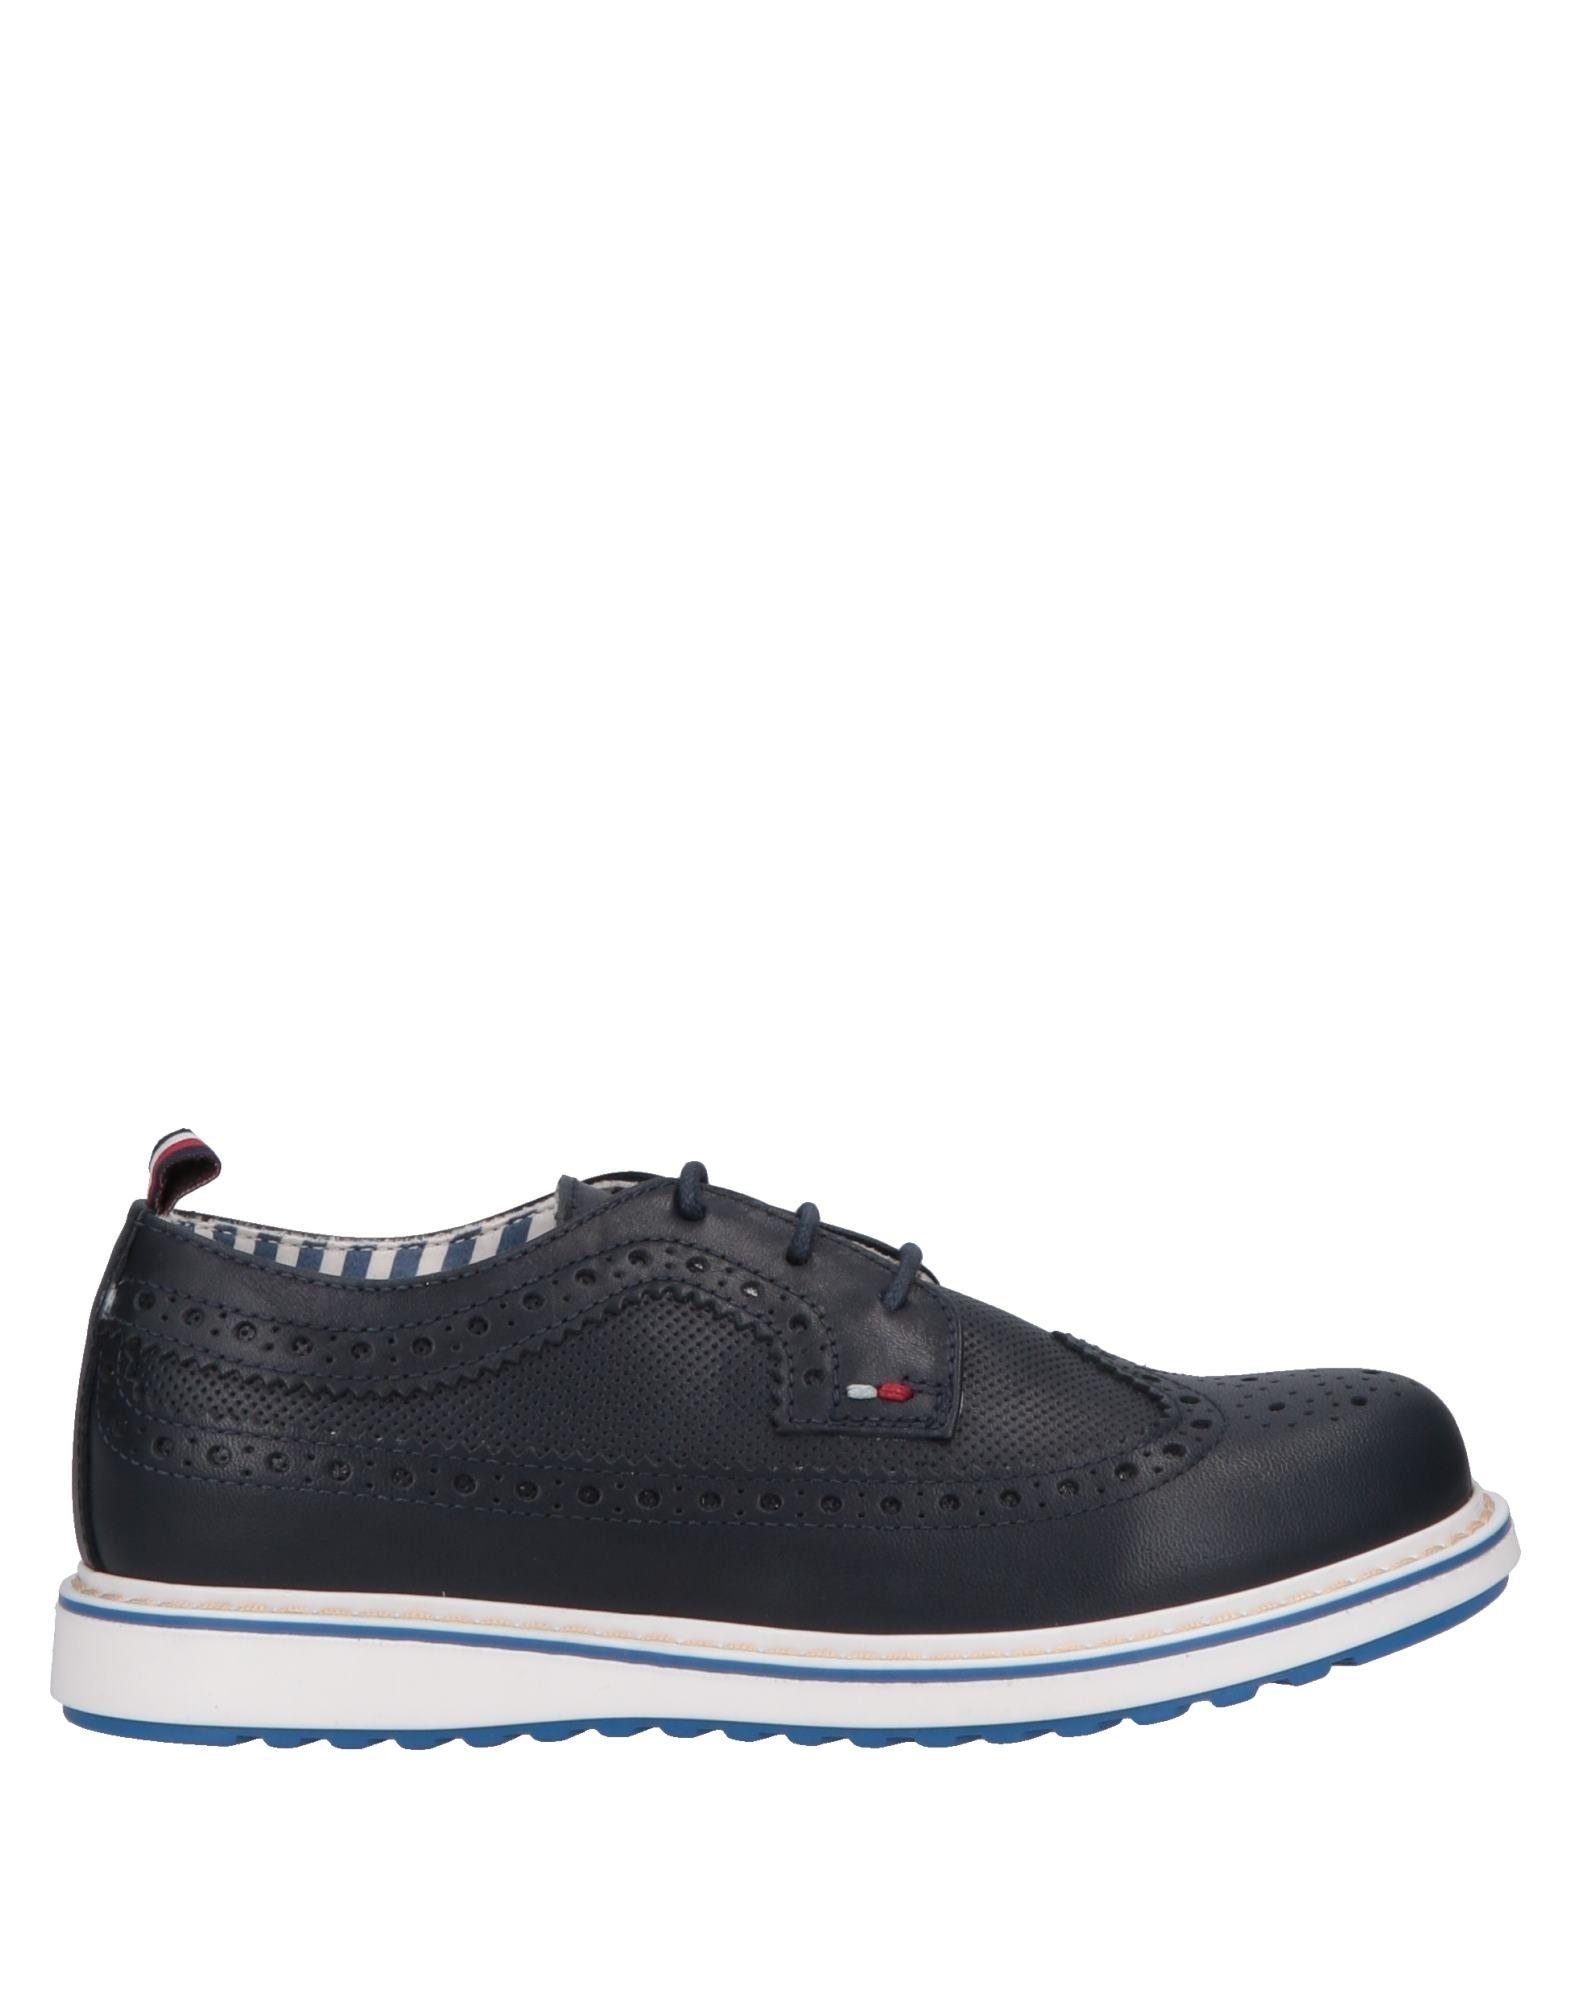 TOMMY HILFIGER Обувь на шнурках цены онлайн